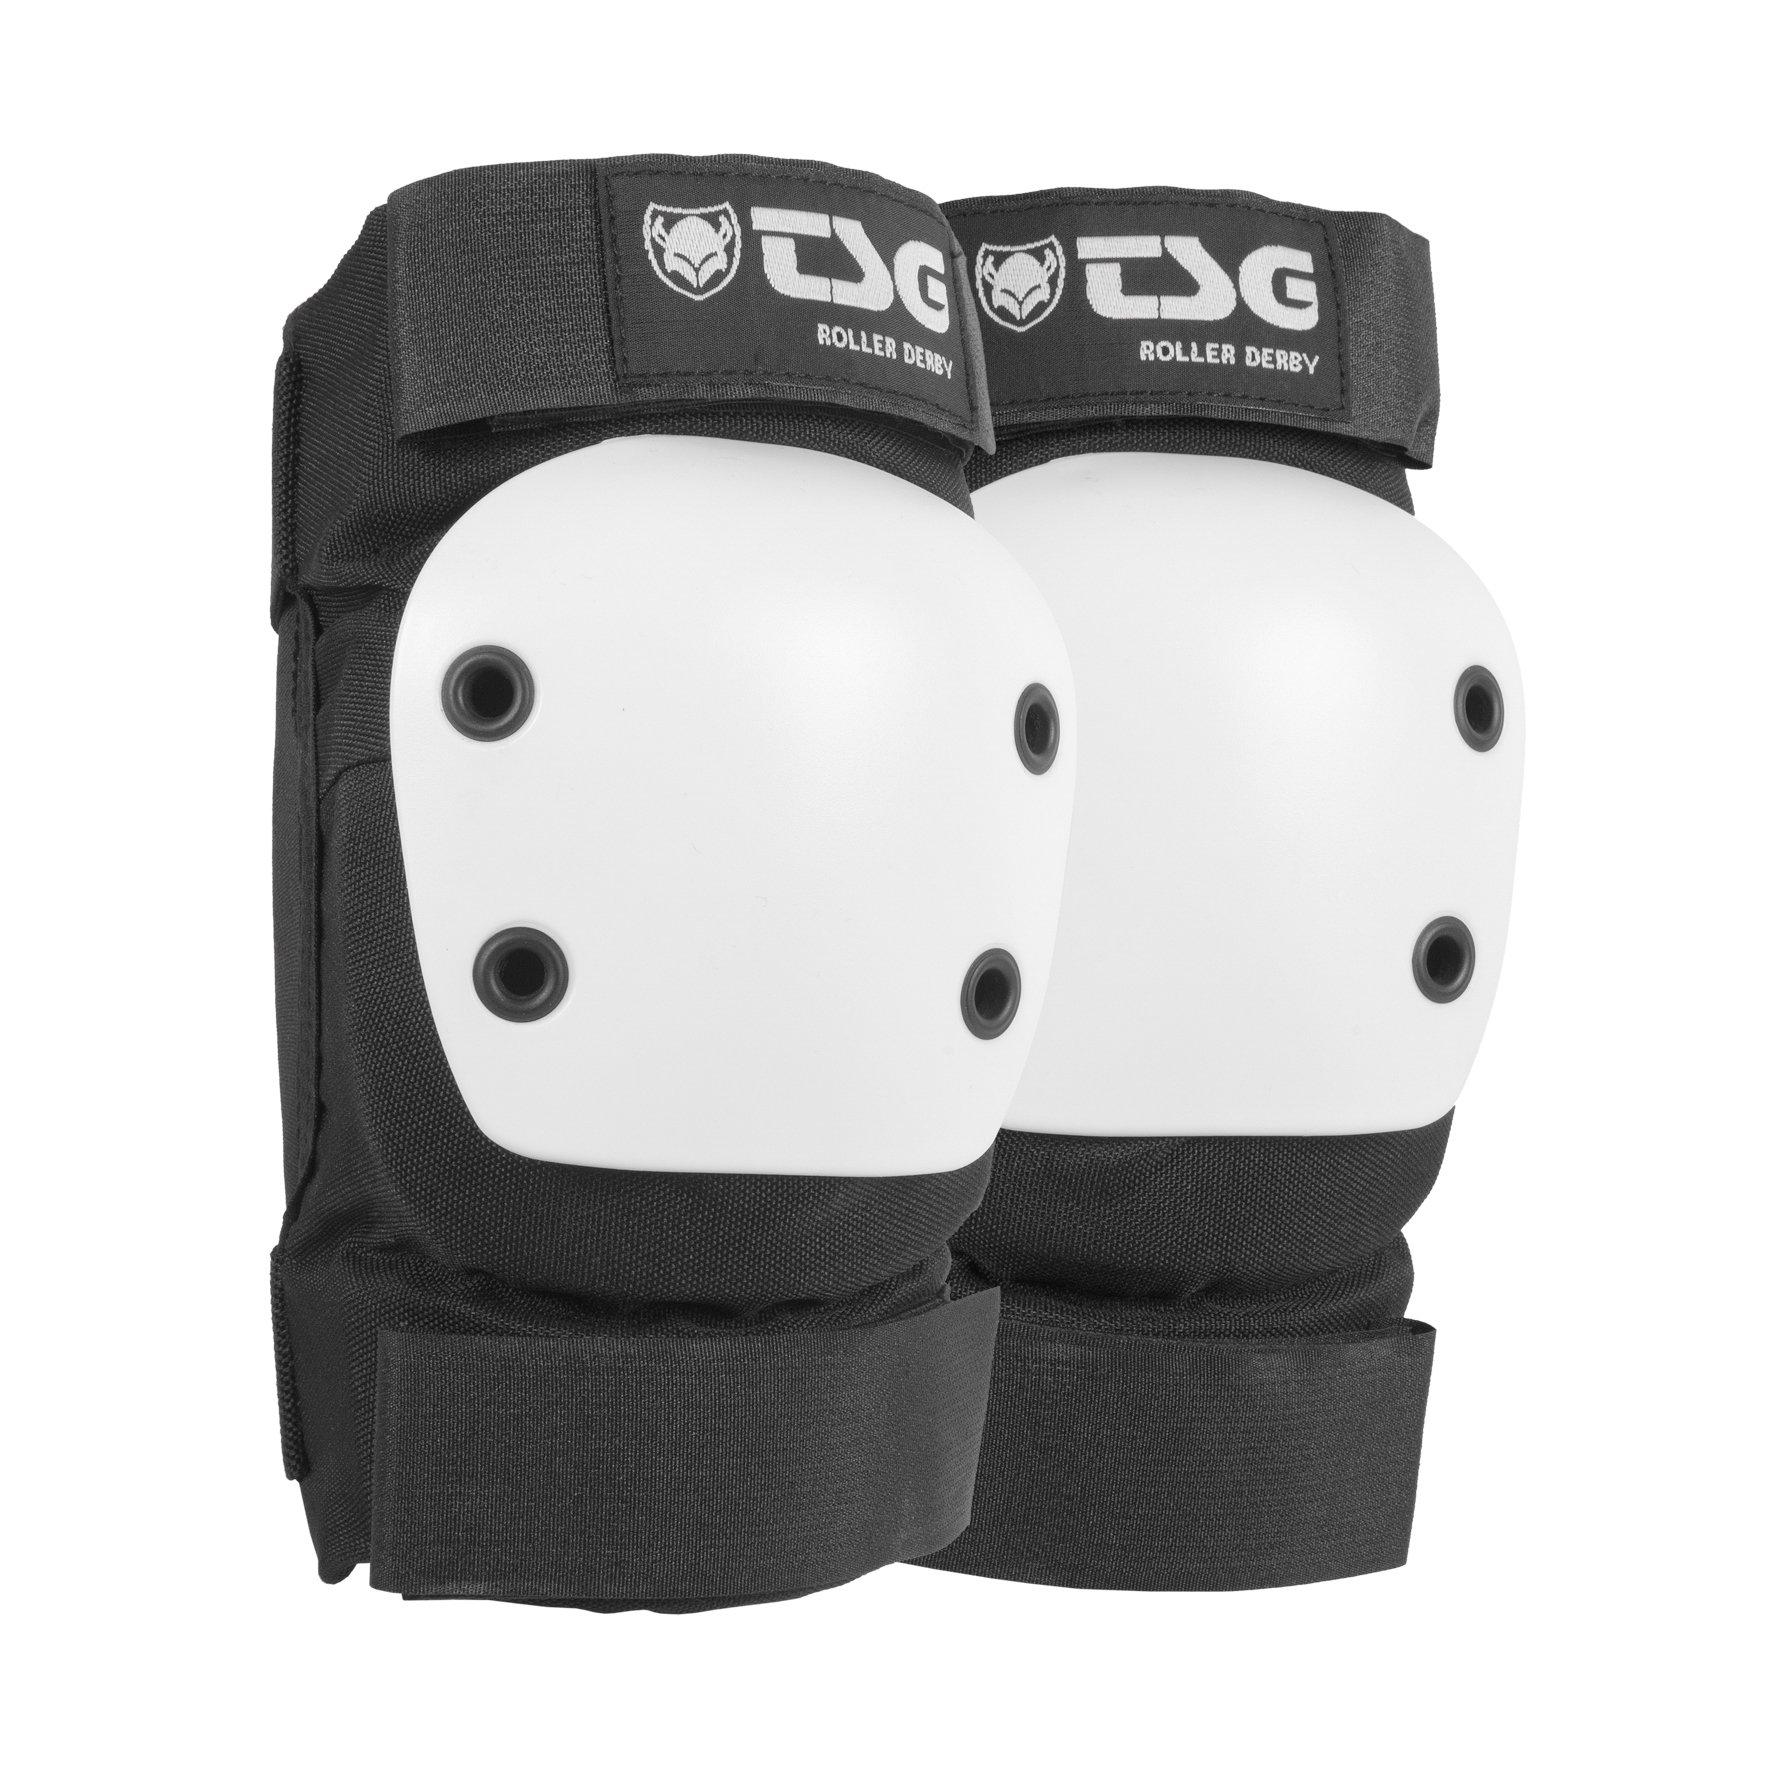 TSG - Elbowpad Roller Derby 2.0 Pads for Skateboard (black, XS)